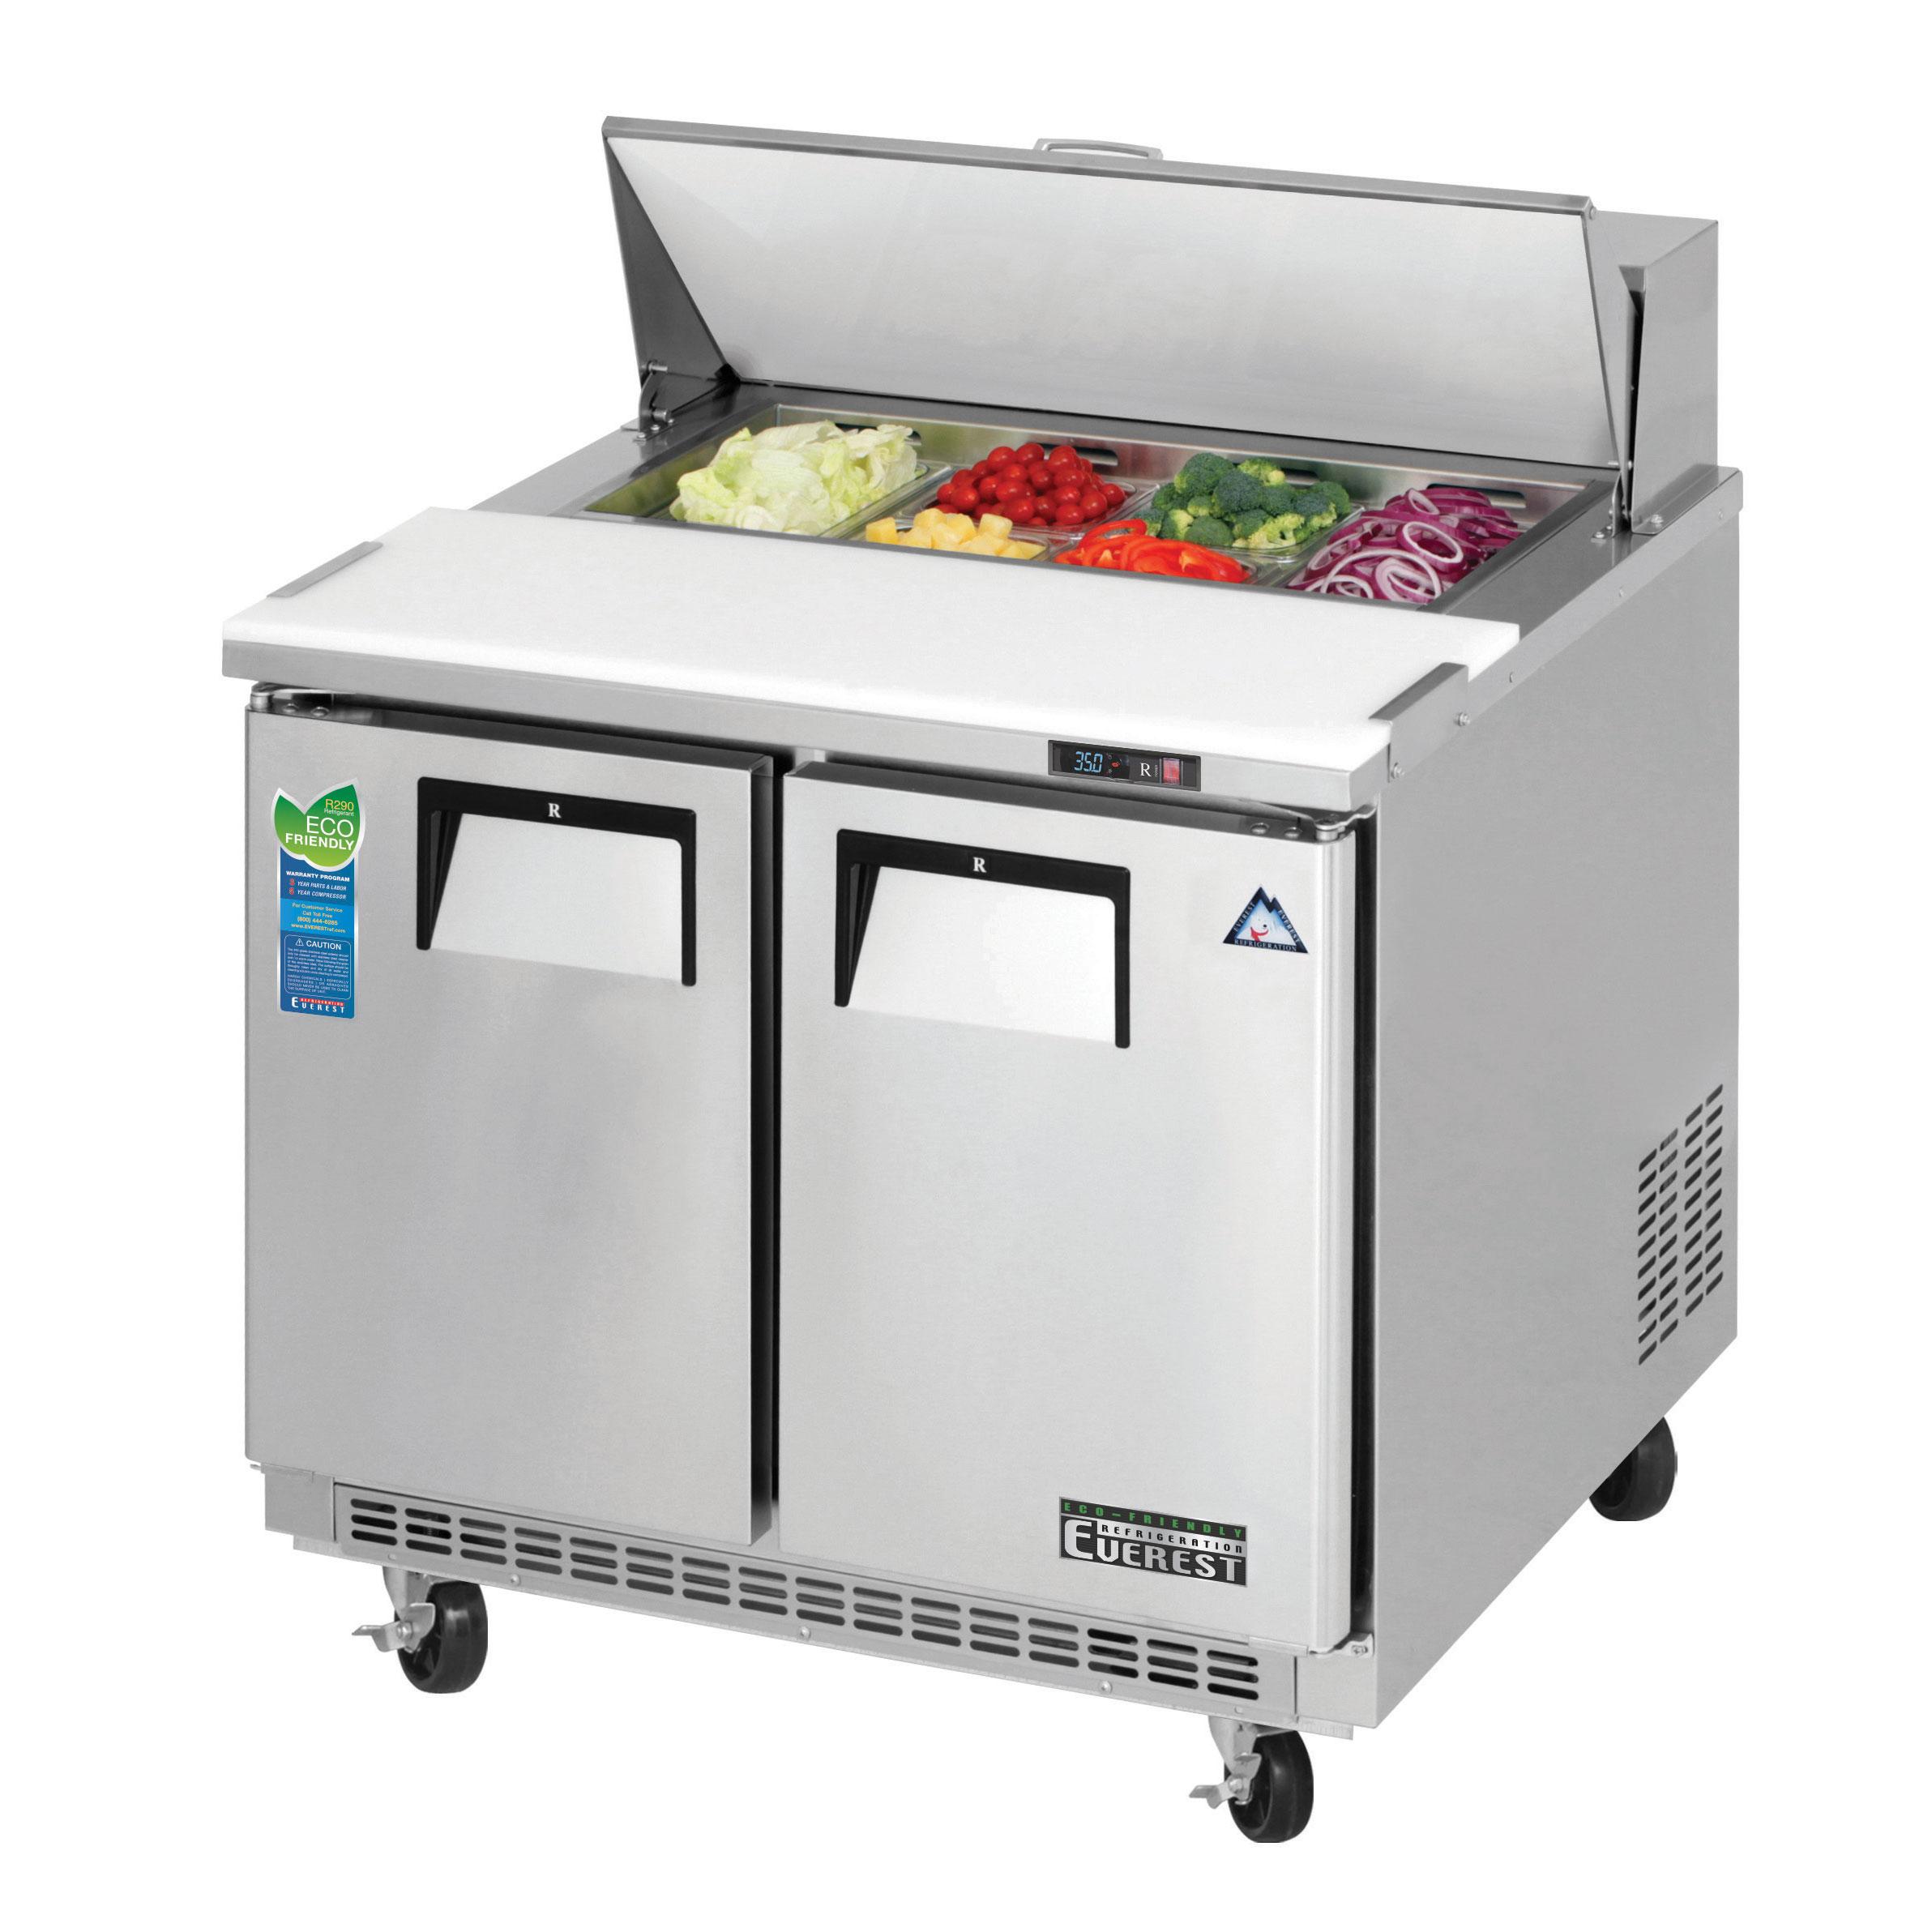 Everest Refrigeration EPBNSR2 refrigerated counter, sandwich / salad unit